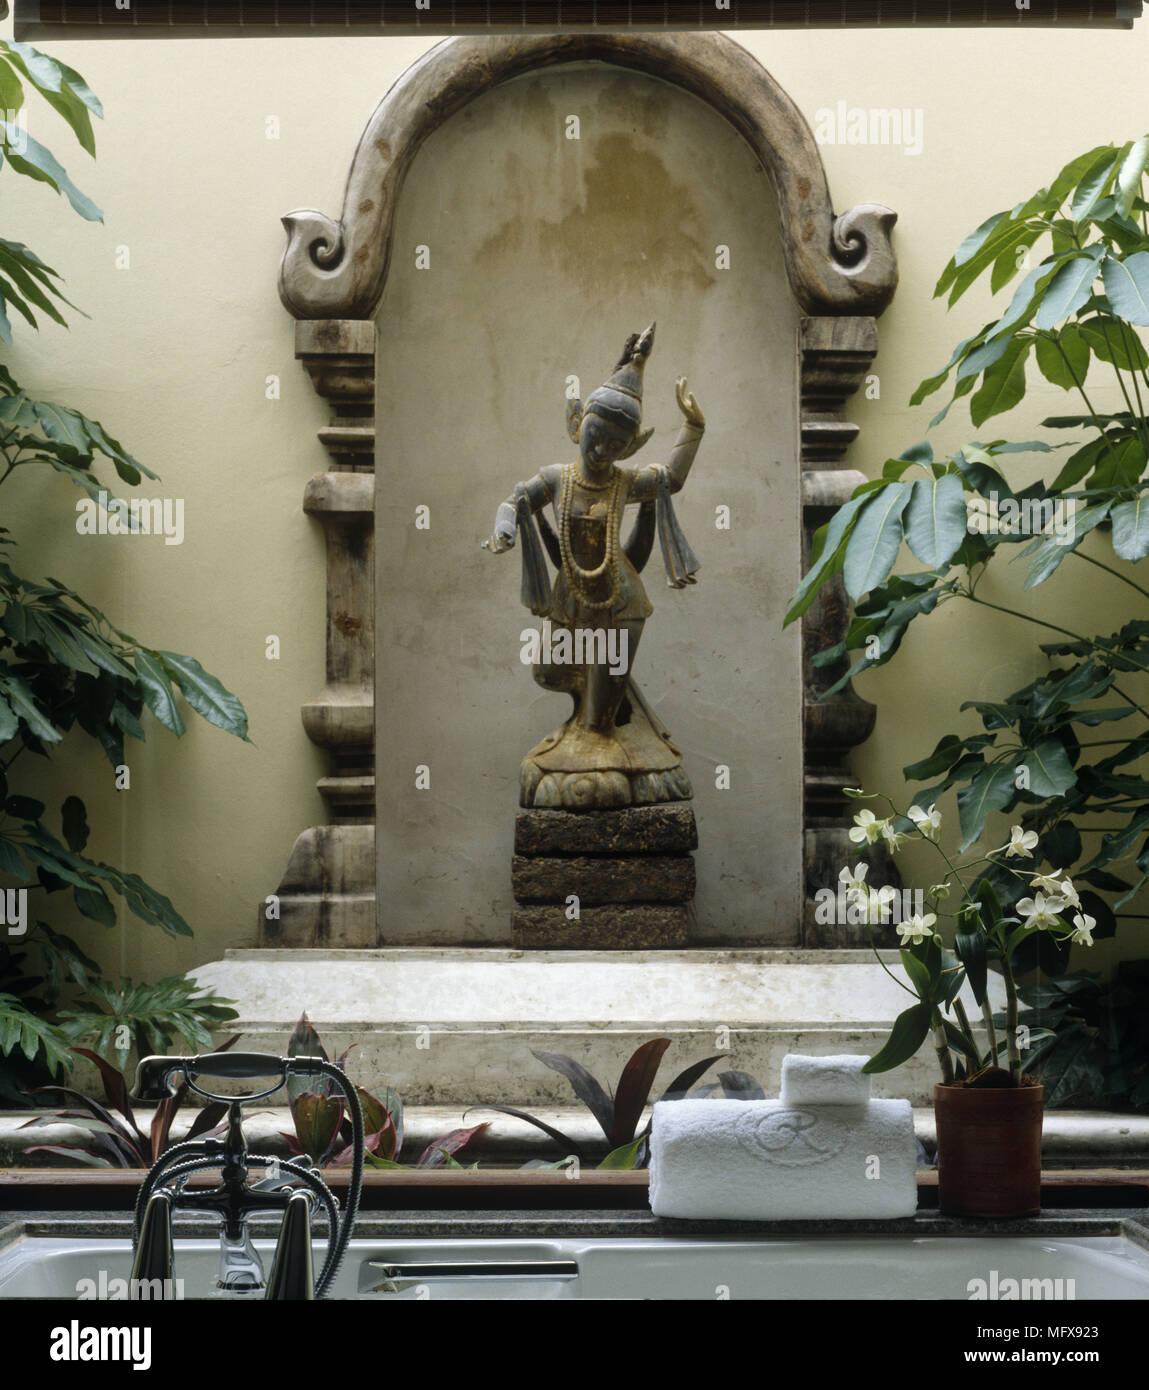 Far Eastern style figurine behind bathtub - Stock Image